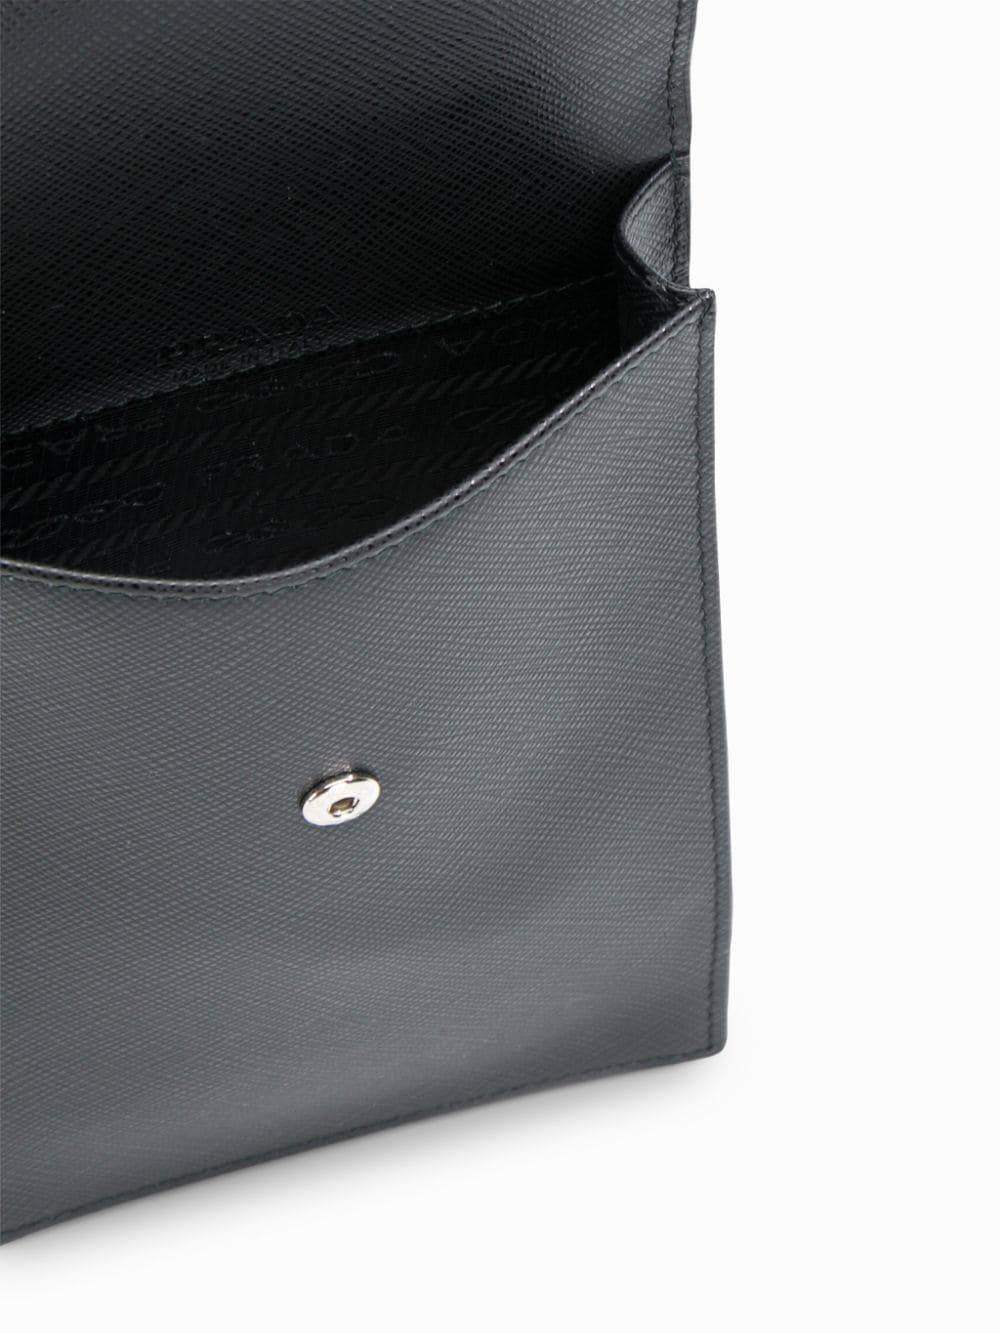 2859c9f53 ... Prada - Black Small Detachable Strap Leather Pouch for Men - Lyst.  Visit Eraldo. Tap to visit site